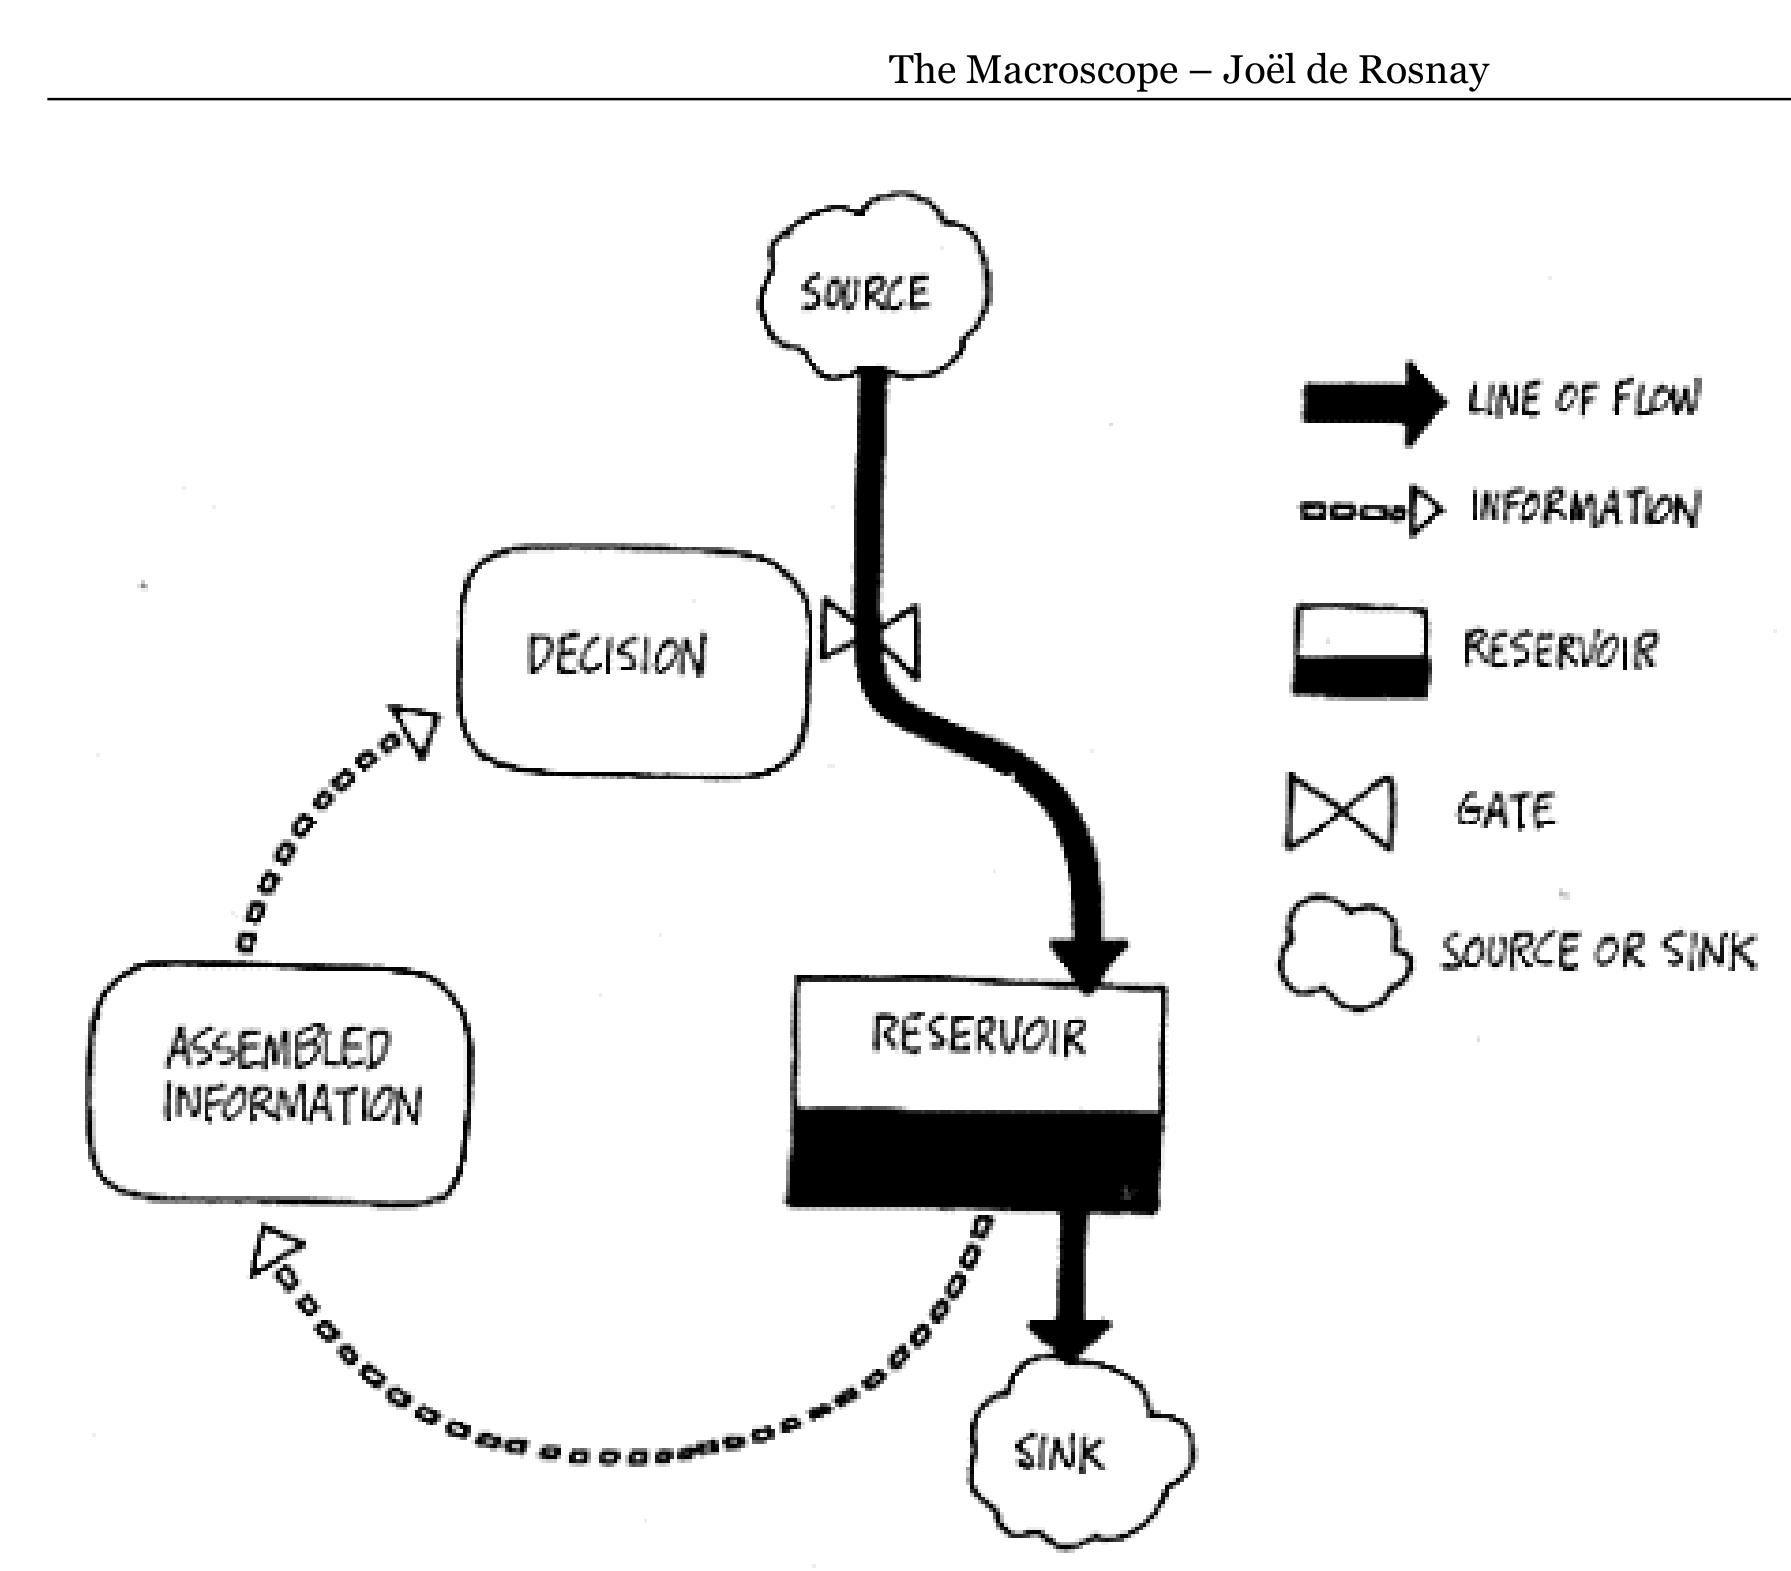 Macroscope Joel De Rosnay